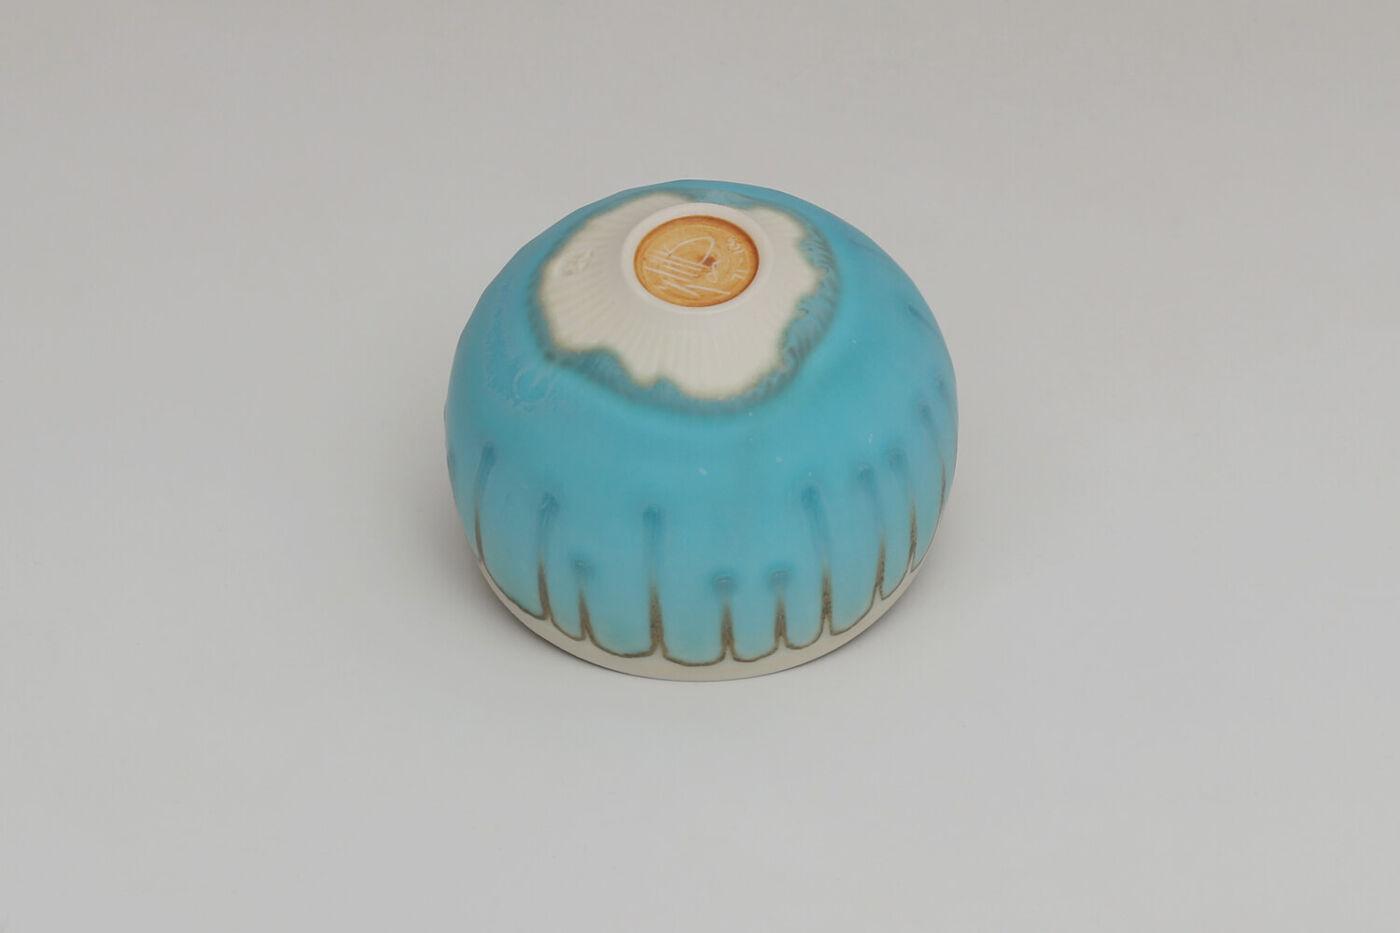 Peter Wills Ceramic Blue Porcelain Bowl 208